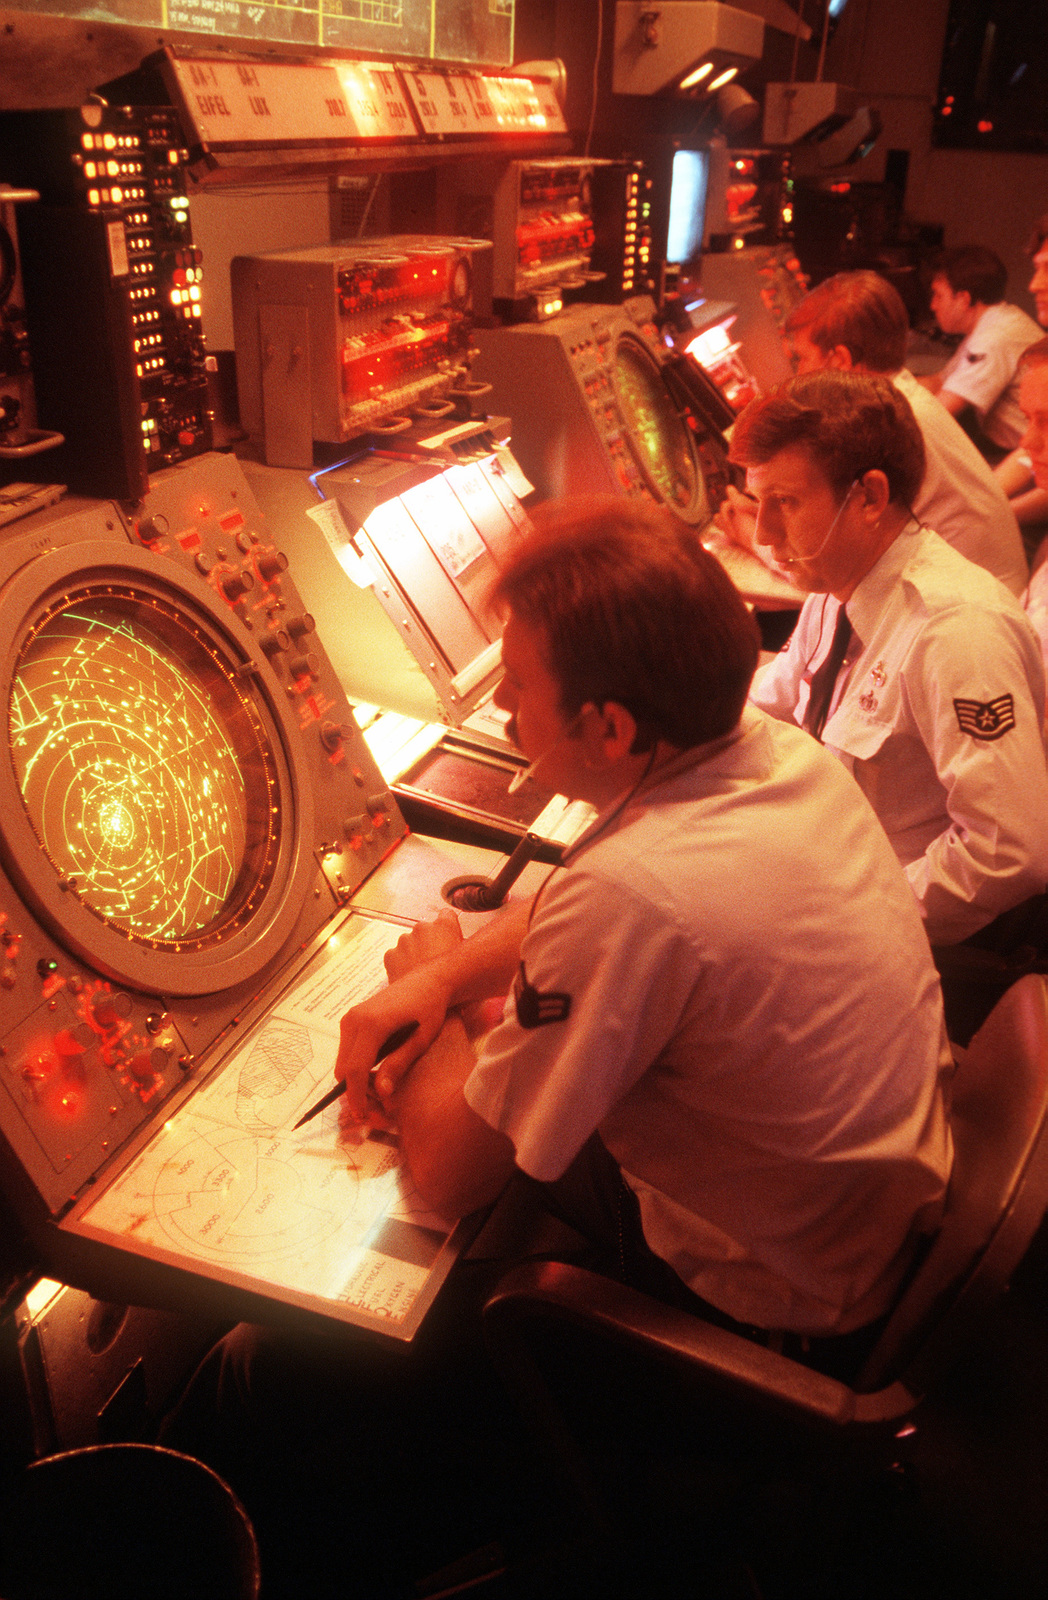 U.S. AIRMAN in the Eifel air traffic control facility, check their radar scopes for air traffic in a 60-mile radius